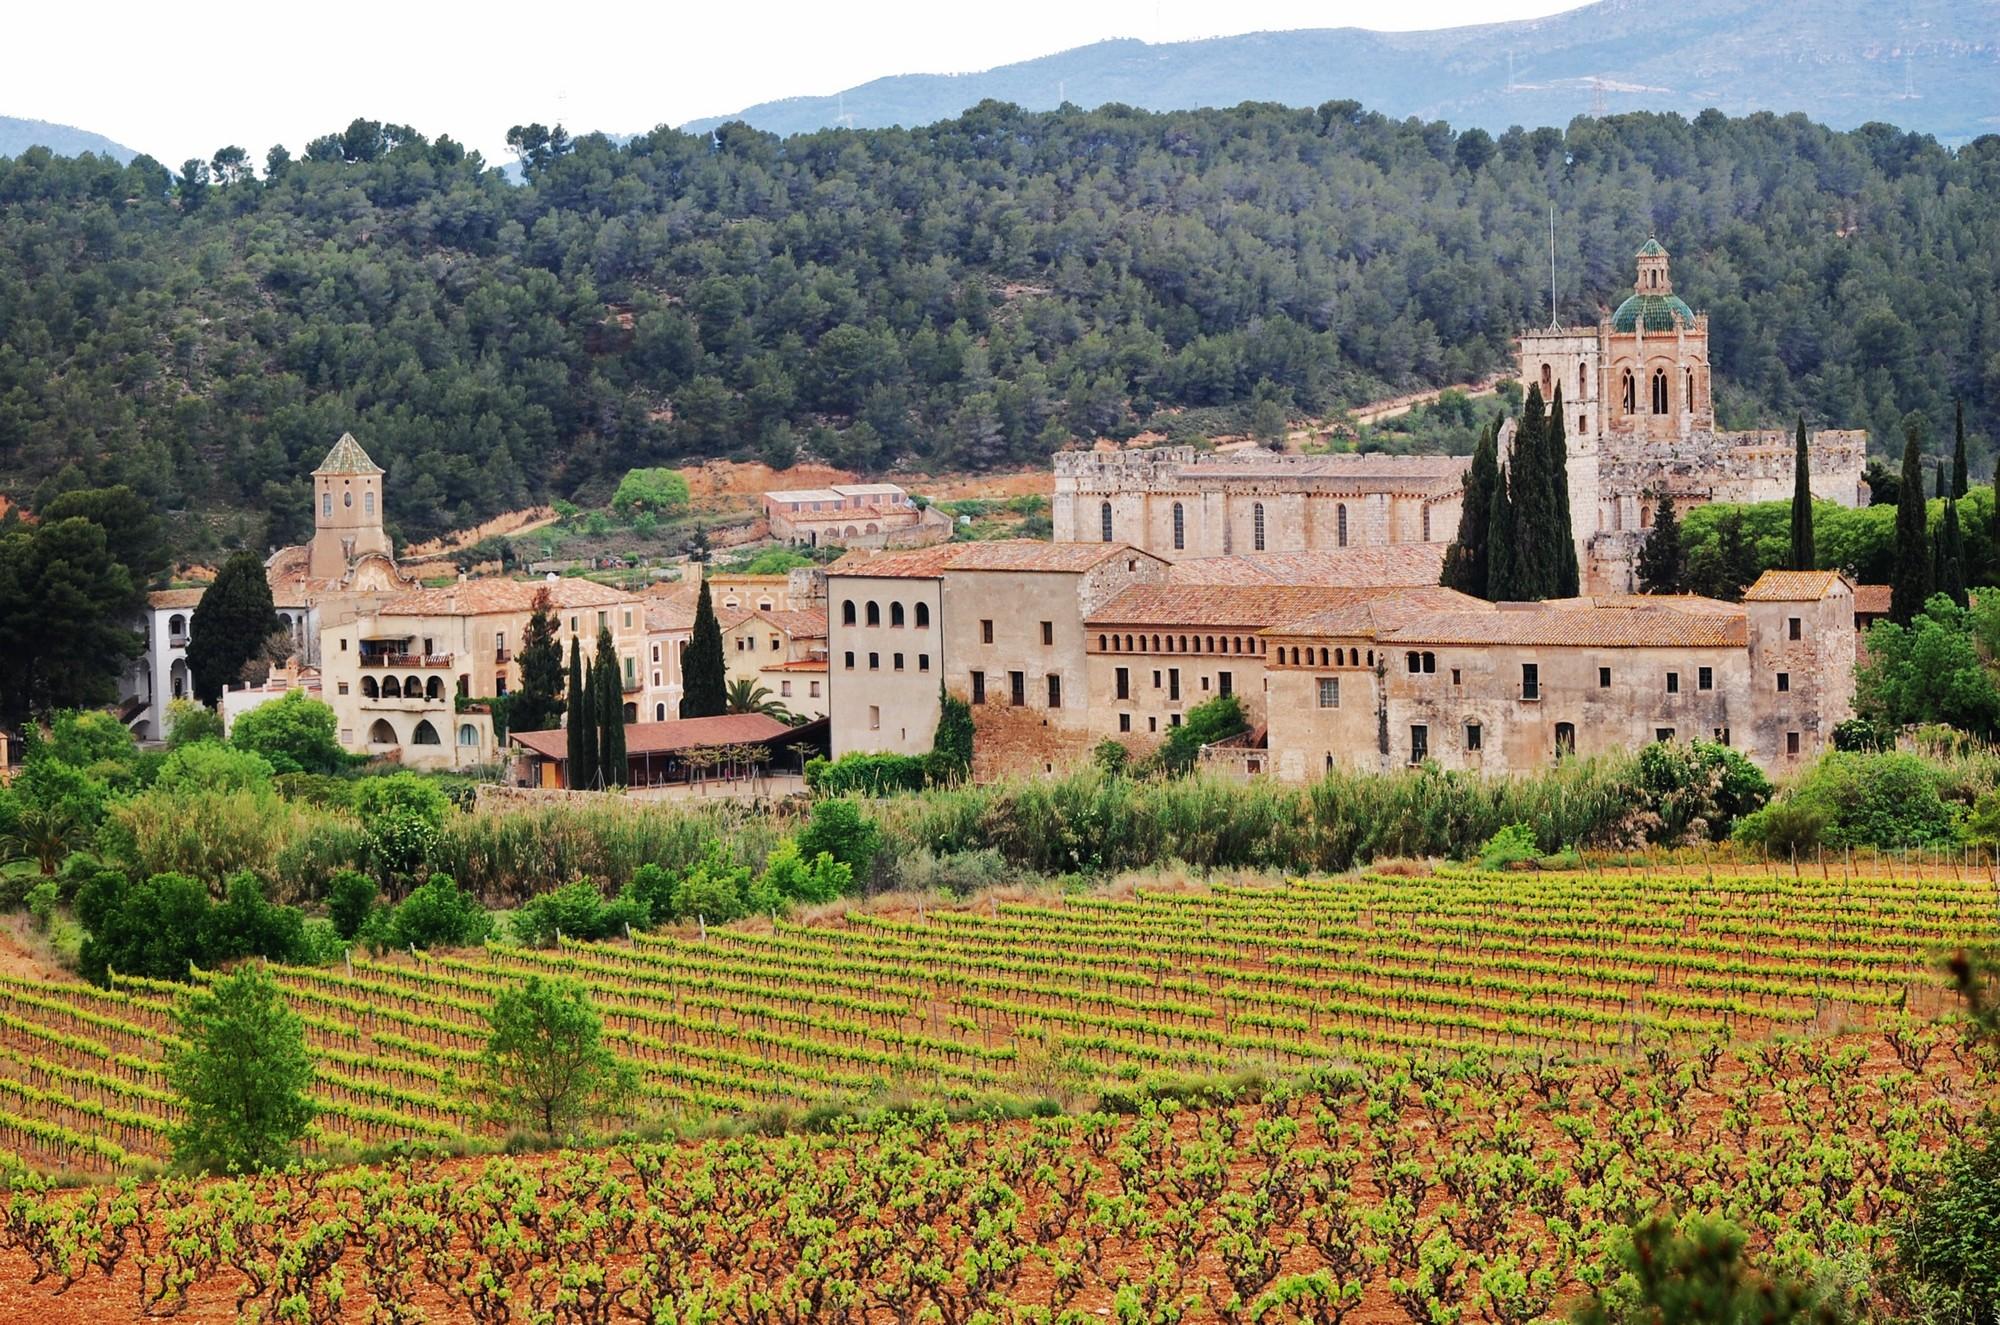 Monastero di Santes Creus ©Foto Maria Rosa Ferré - Agència Catalana de Turisme